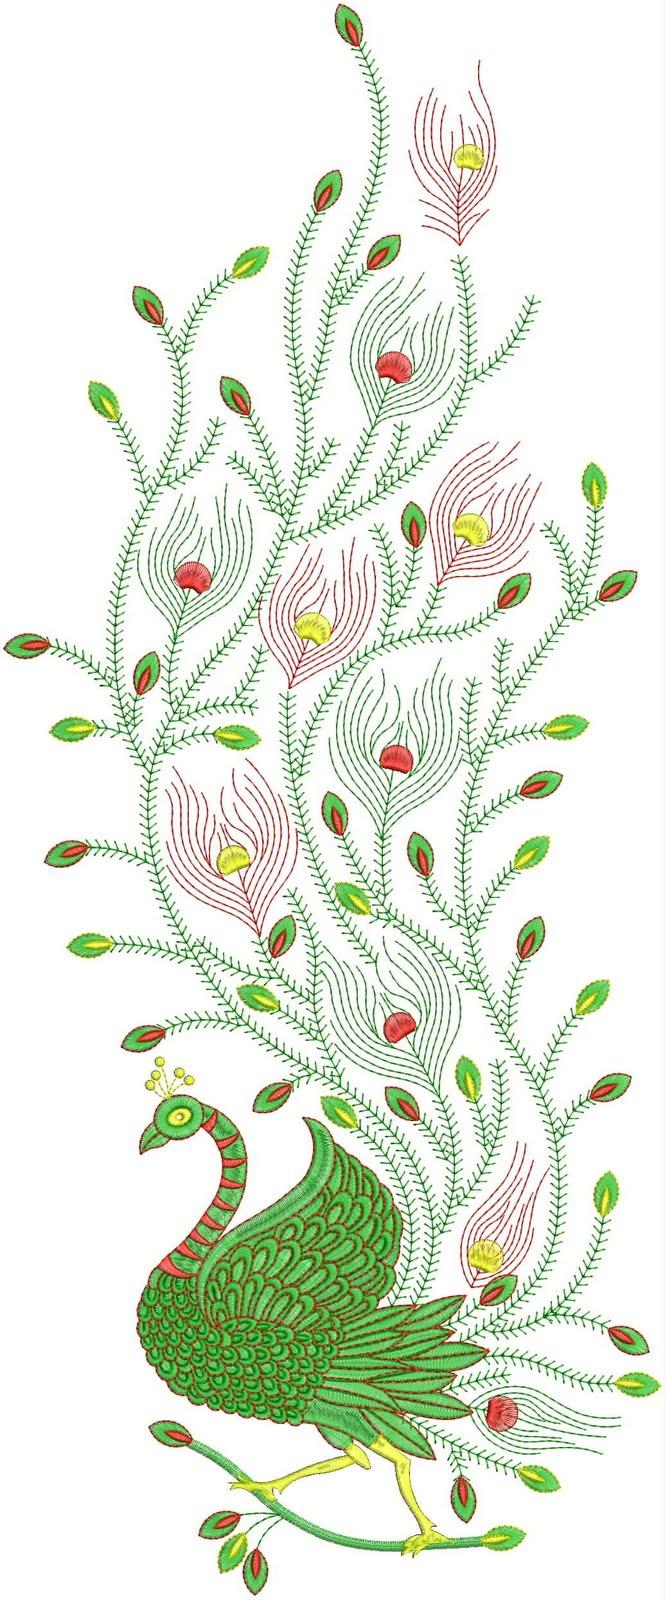 Embroidery Designs Back Stitch